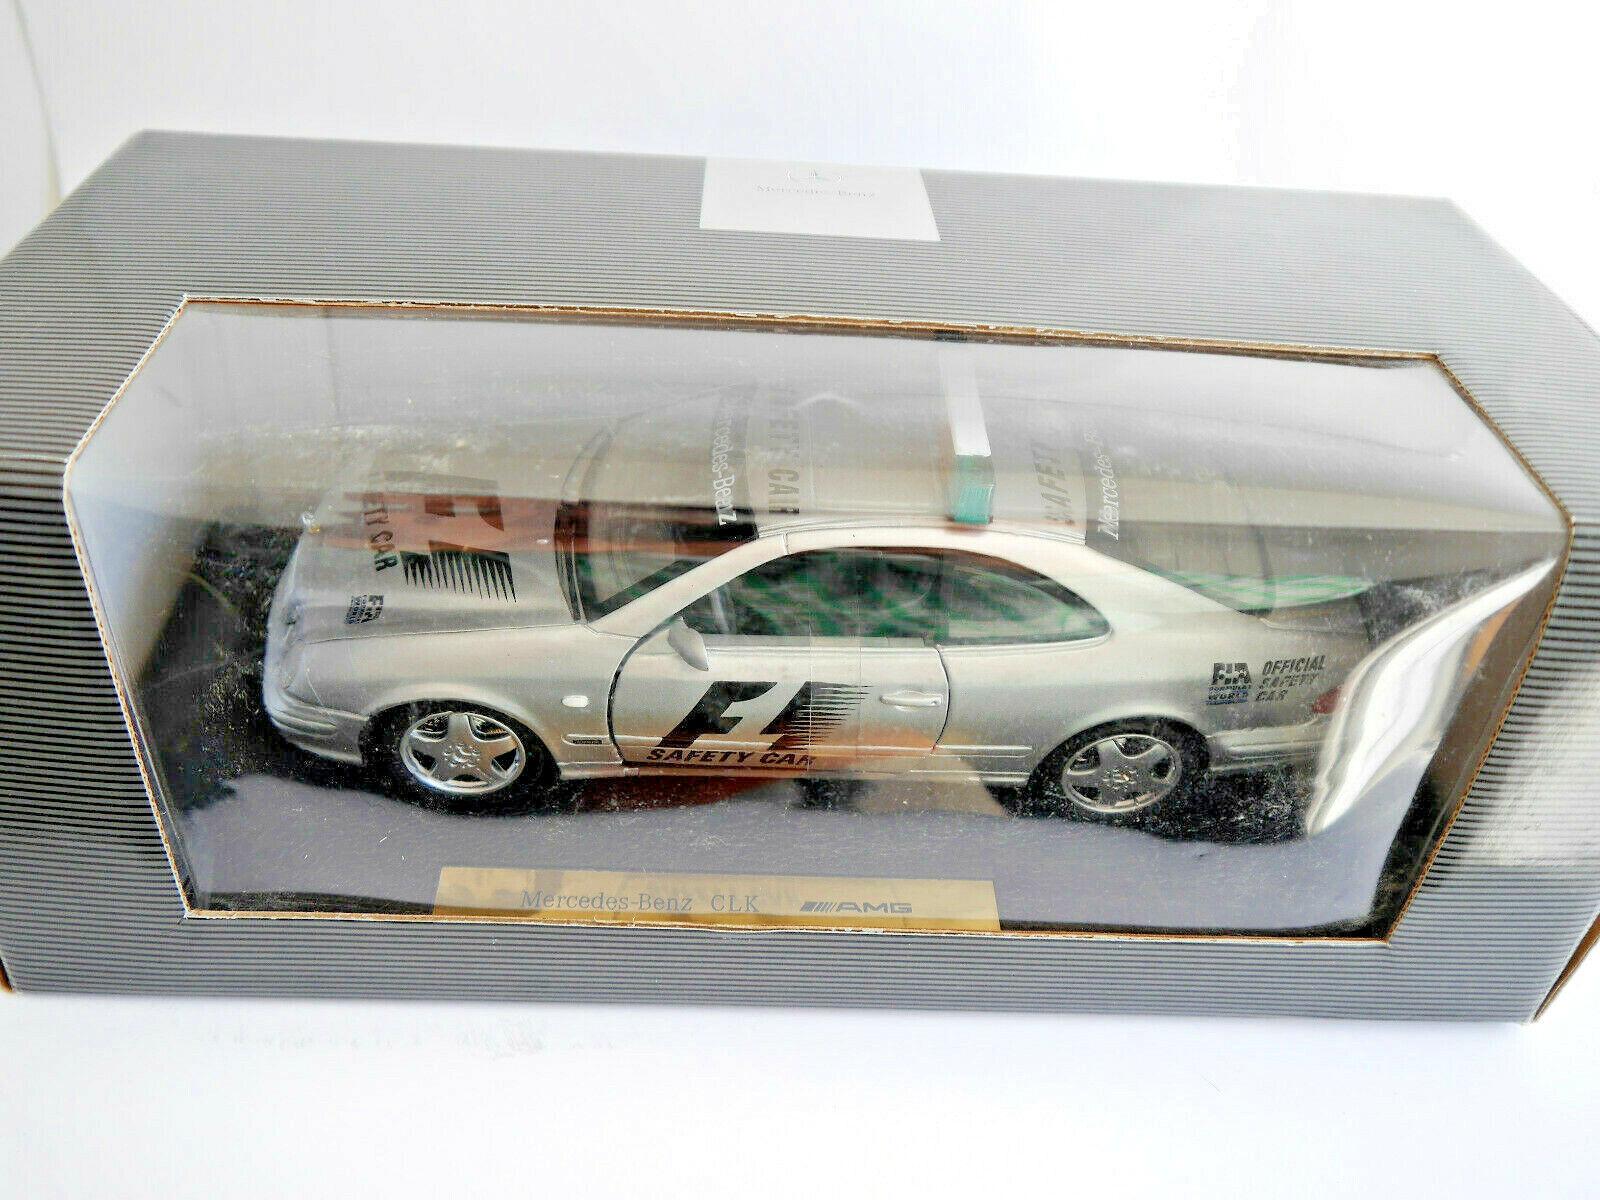 Mercedes C 208 CLK AMG FIA F1 Safety voiture, Anson  MB  B6 600 5234 in 1 18 Dealer  point de vente